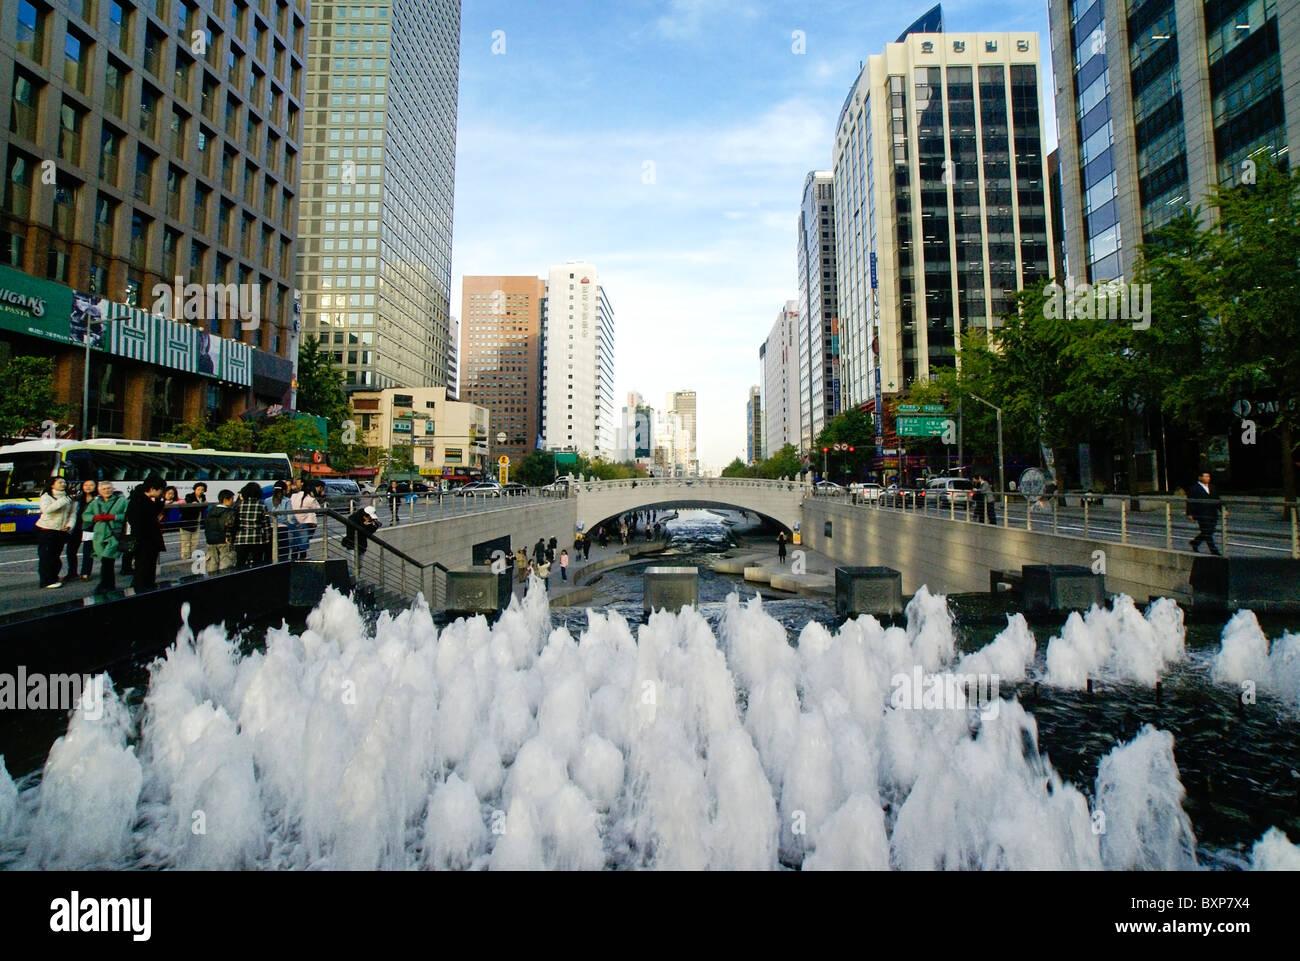 Cheonggye Stream running through business district, Seoul, South Korea - Stock Image